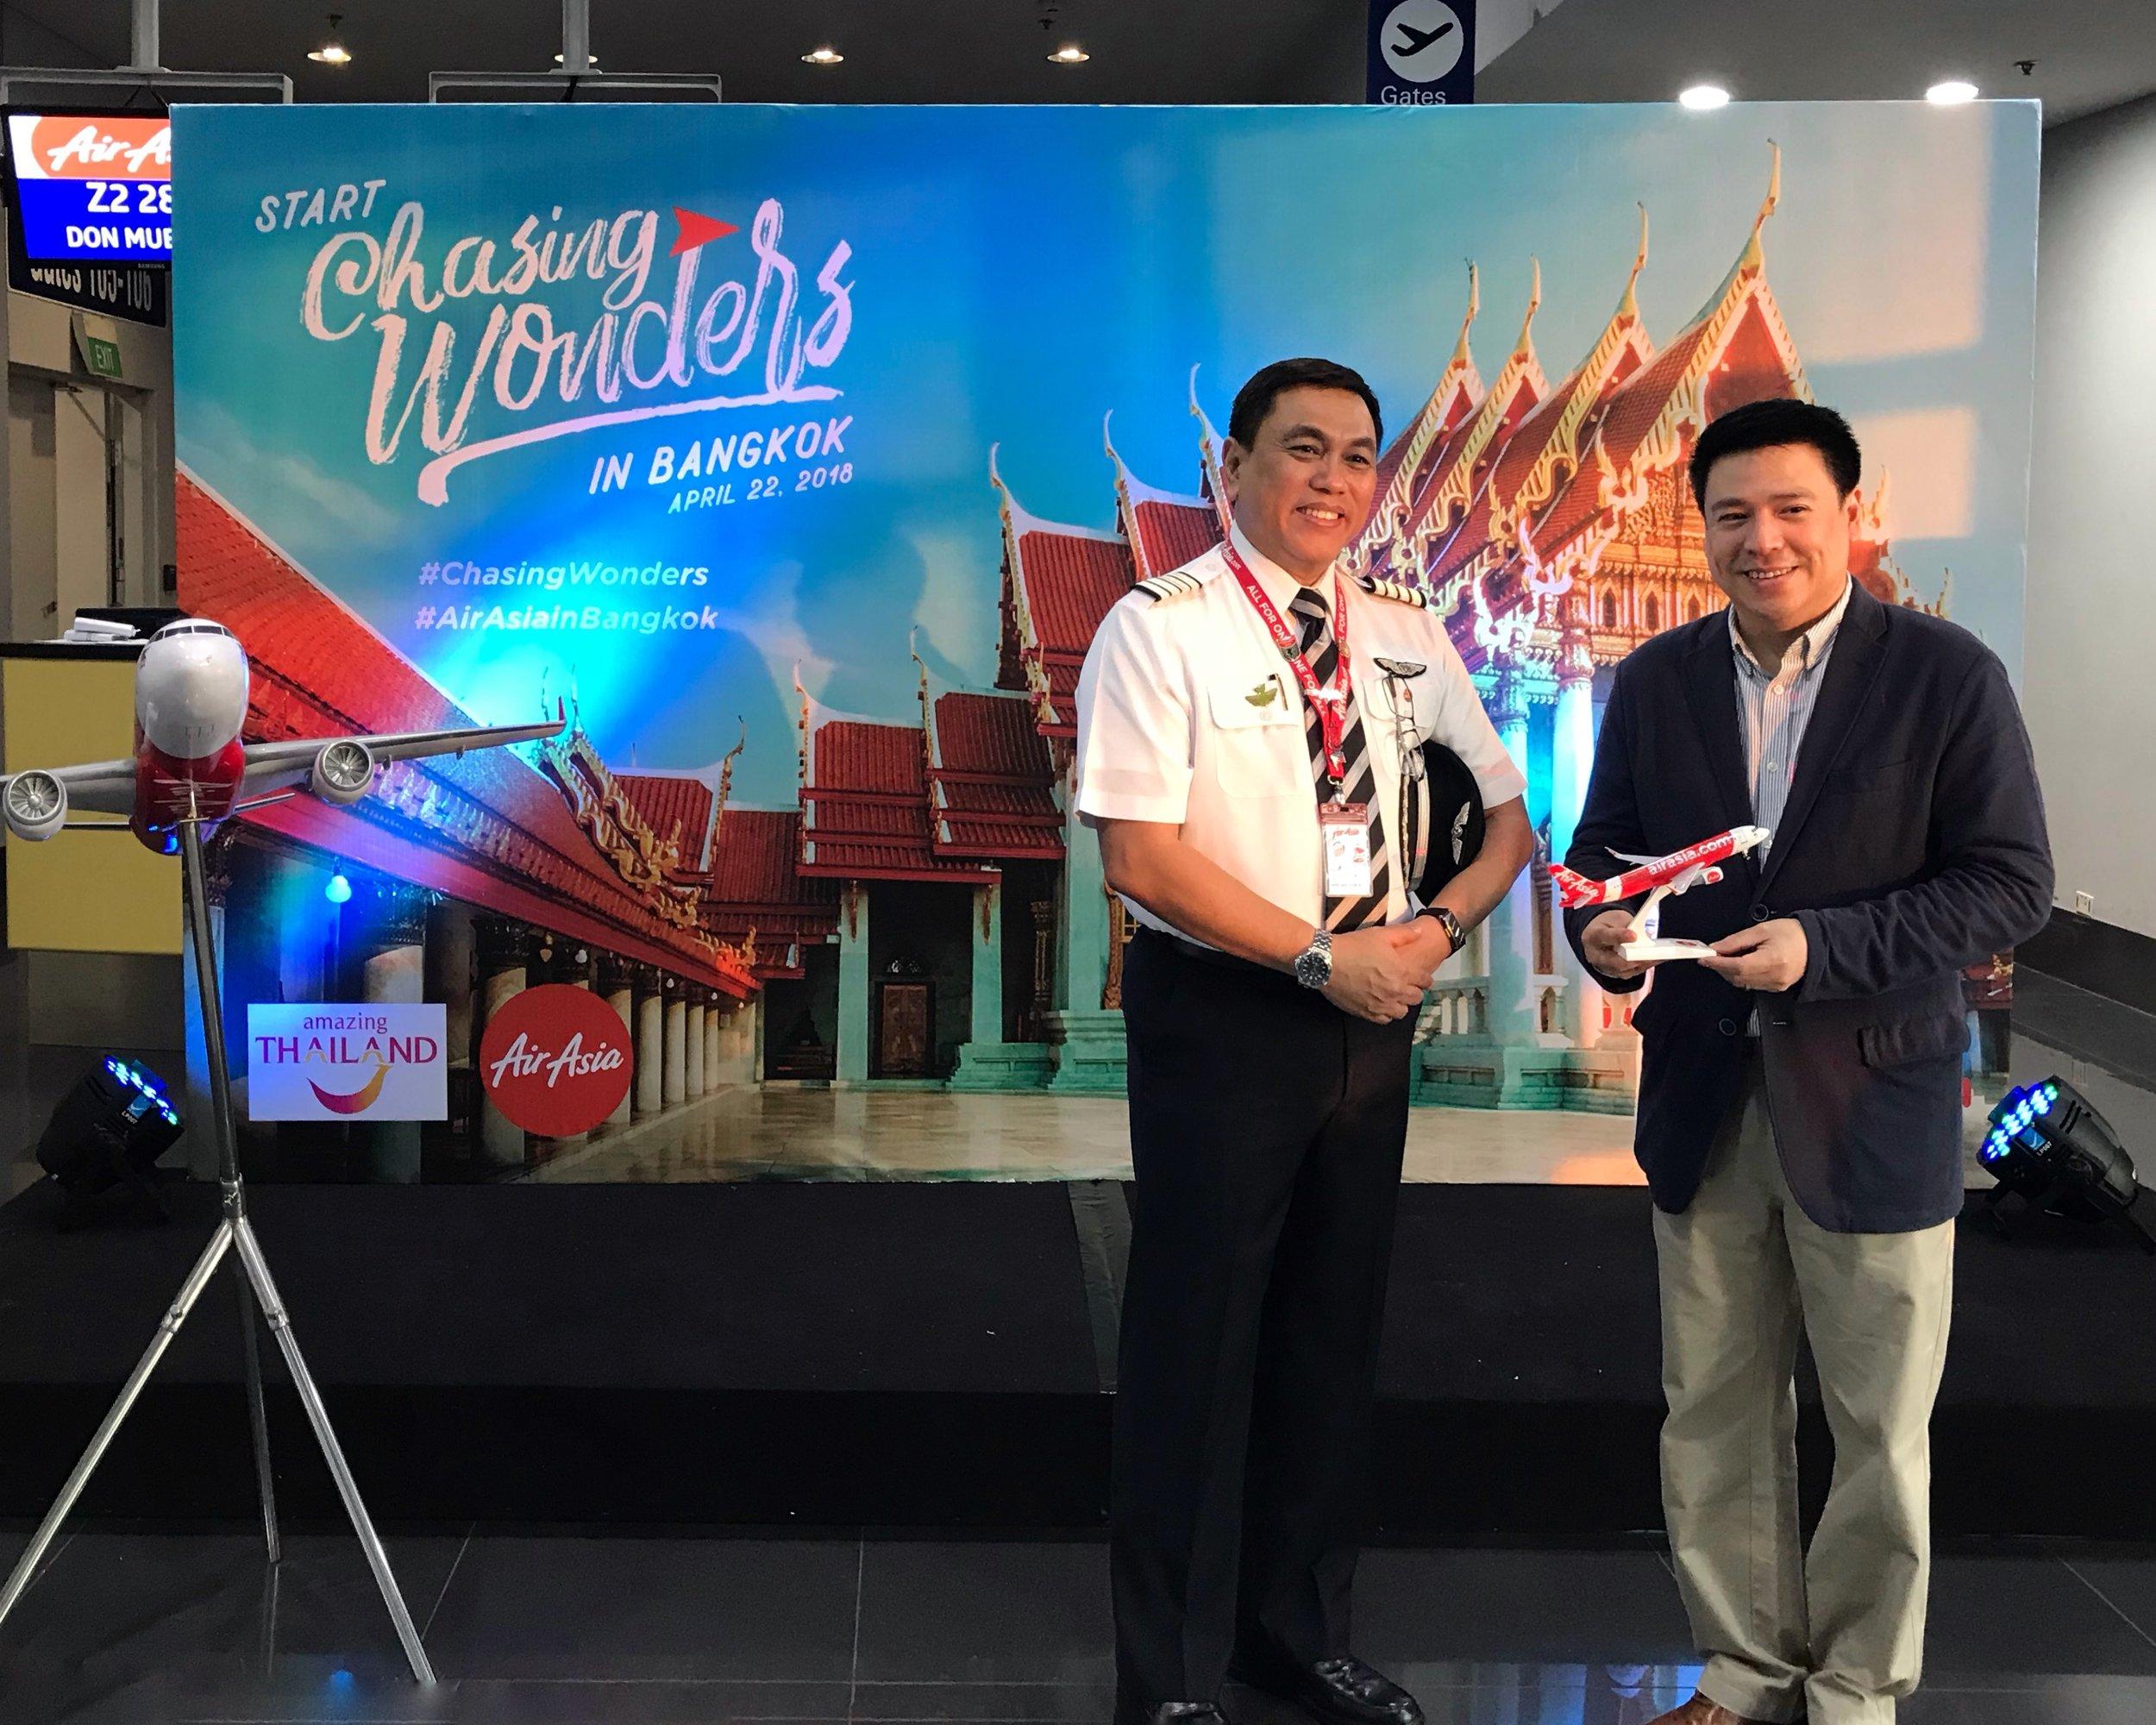 AirAsia Philippines CEO Capt. Dexter Comendador and Tourism Authority of Thailand Director Kajorndet Apichartrakul #AirAsiainBangkok